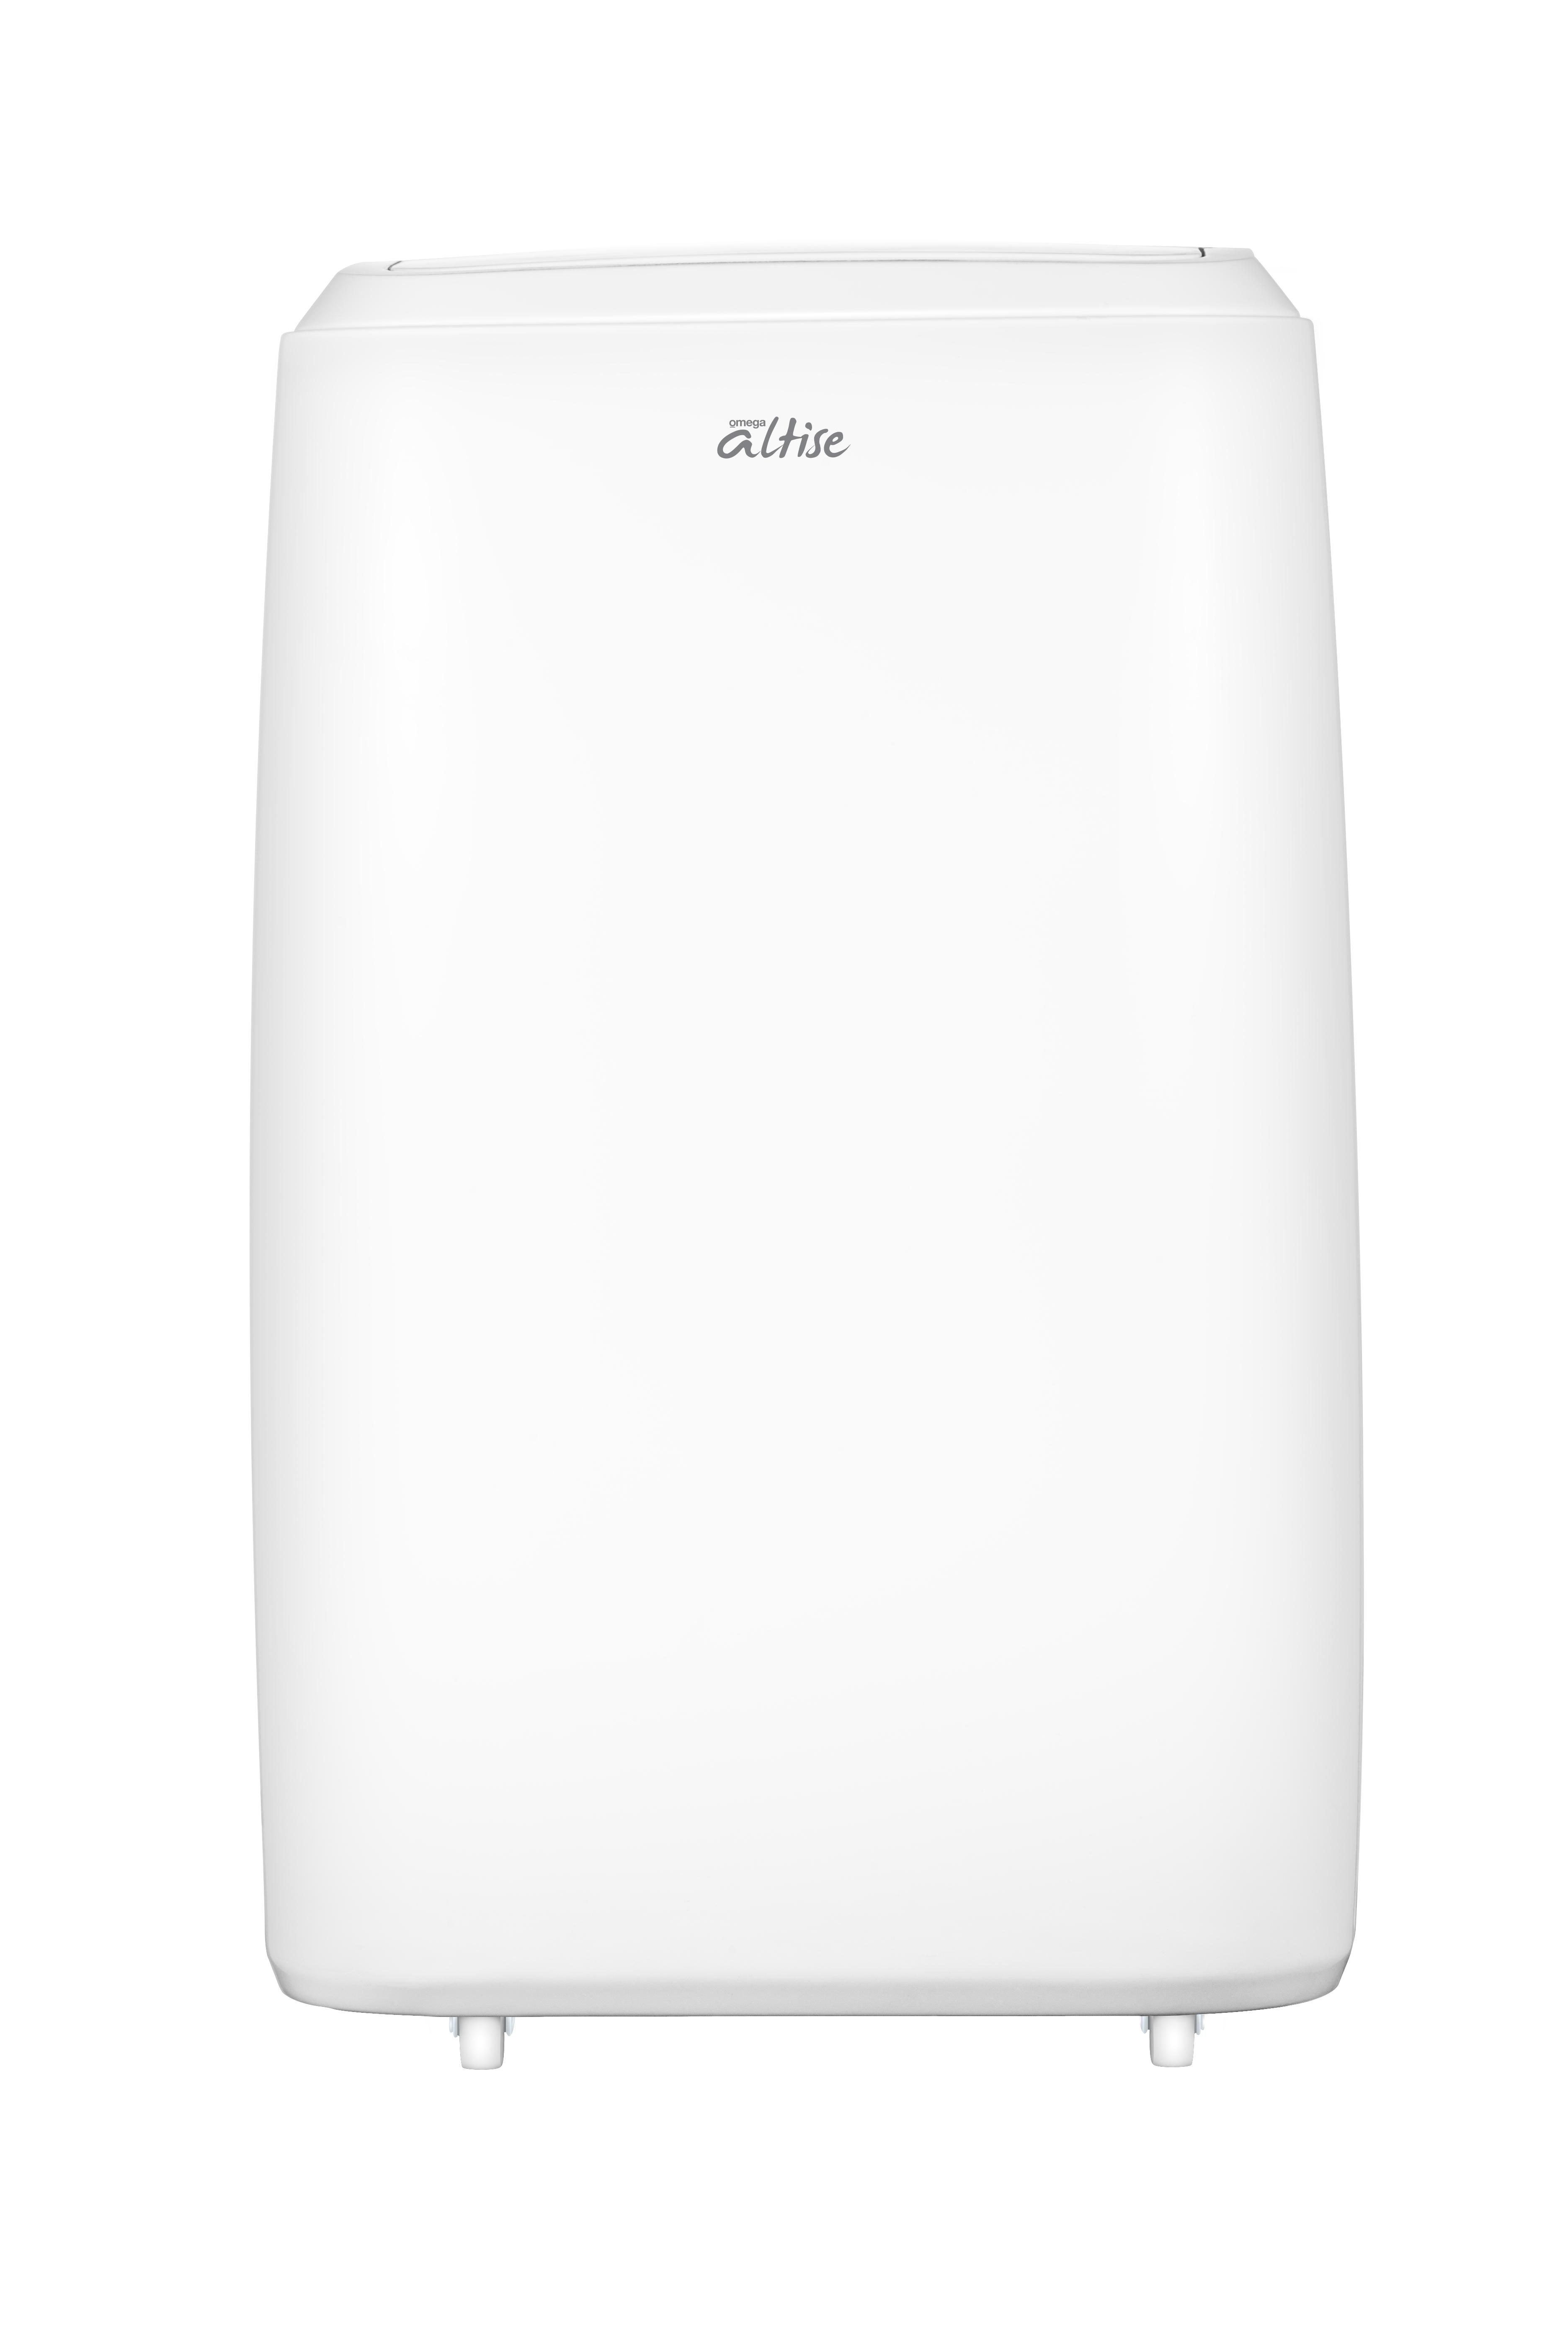 Omega Altise product 4kW Slimline Portable Air-ConditionerOAPC147